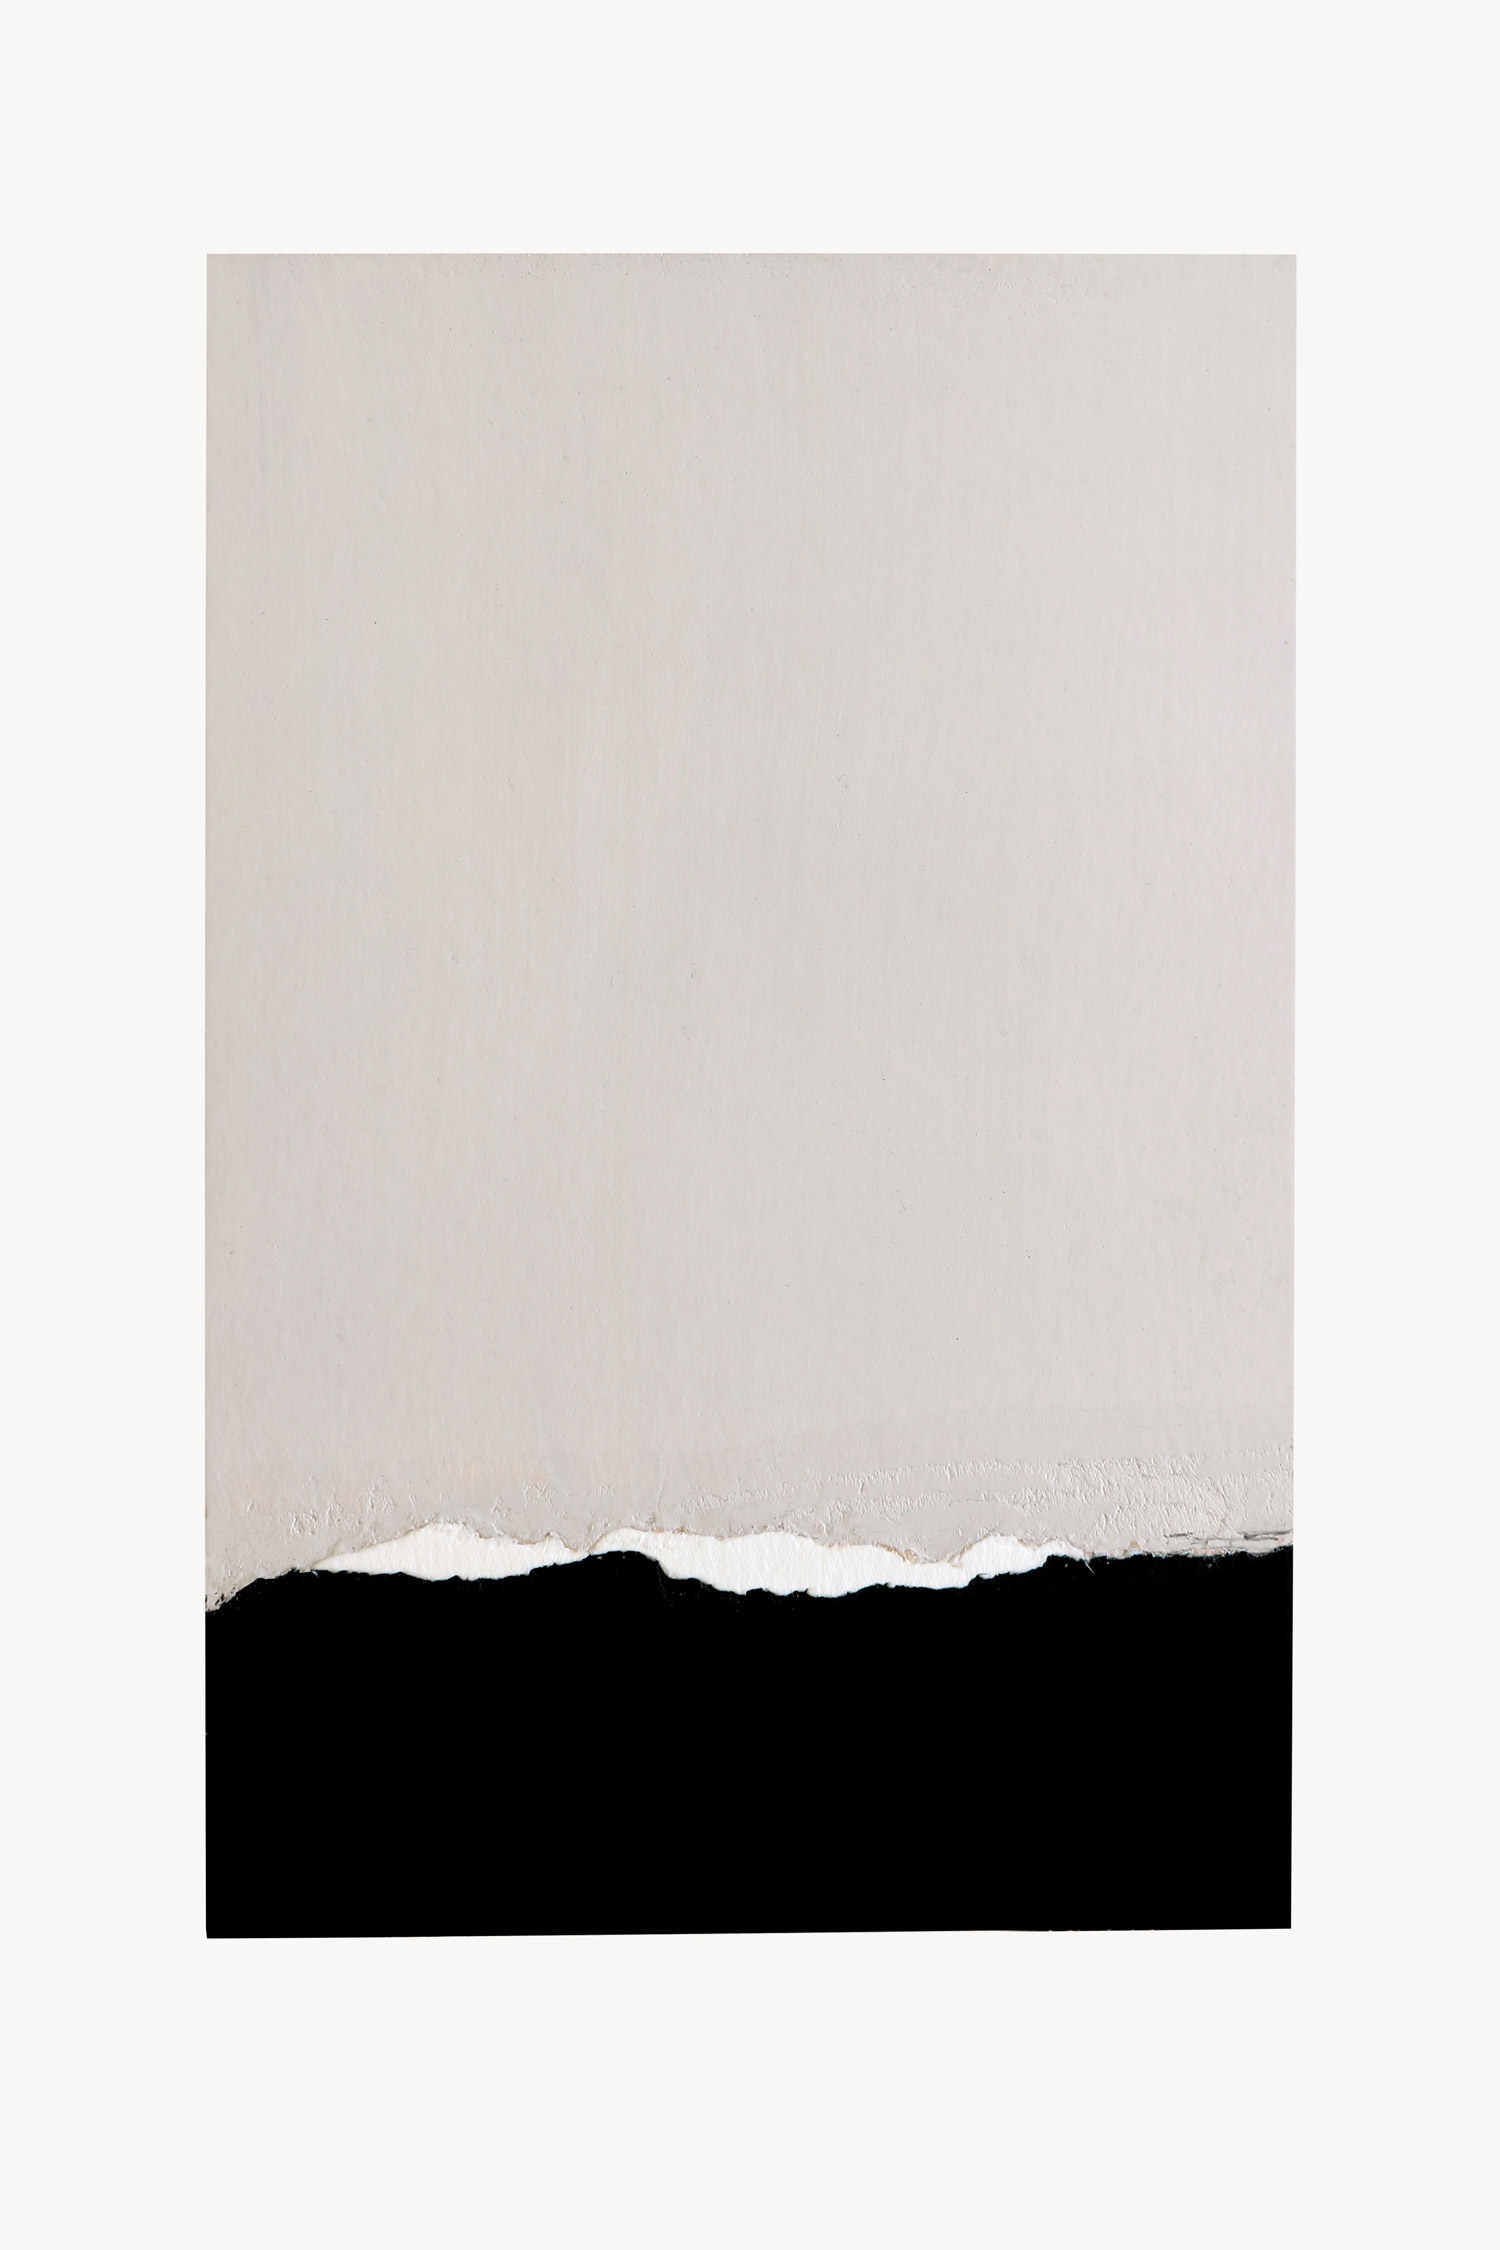 abstract horizon collage, no. 1